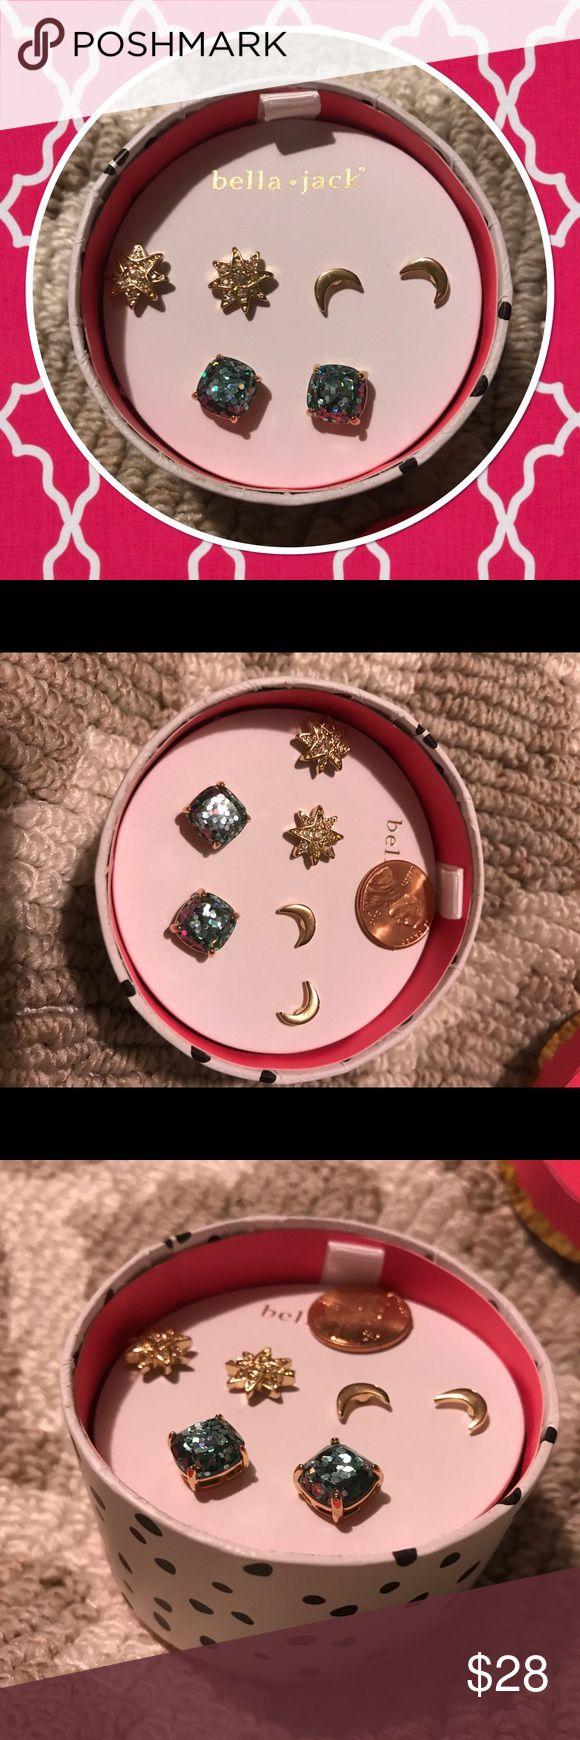 Bella and Jack Stud Trio Blue glitter gumdrop earrings.  Gold crescent earrings.  Sparkle star earrings.  All brand new in box.  Would make a great gift! bella + jack Jewelry Earrings